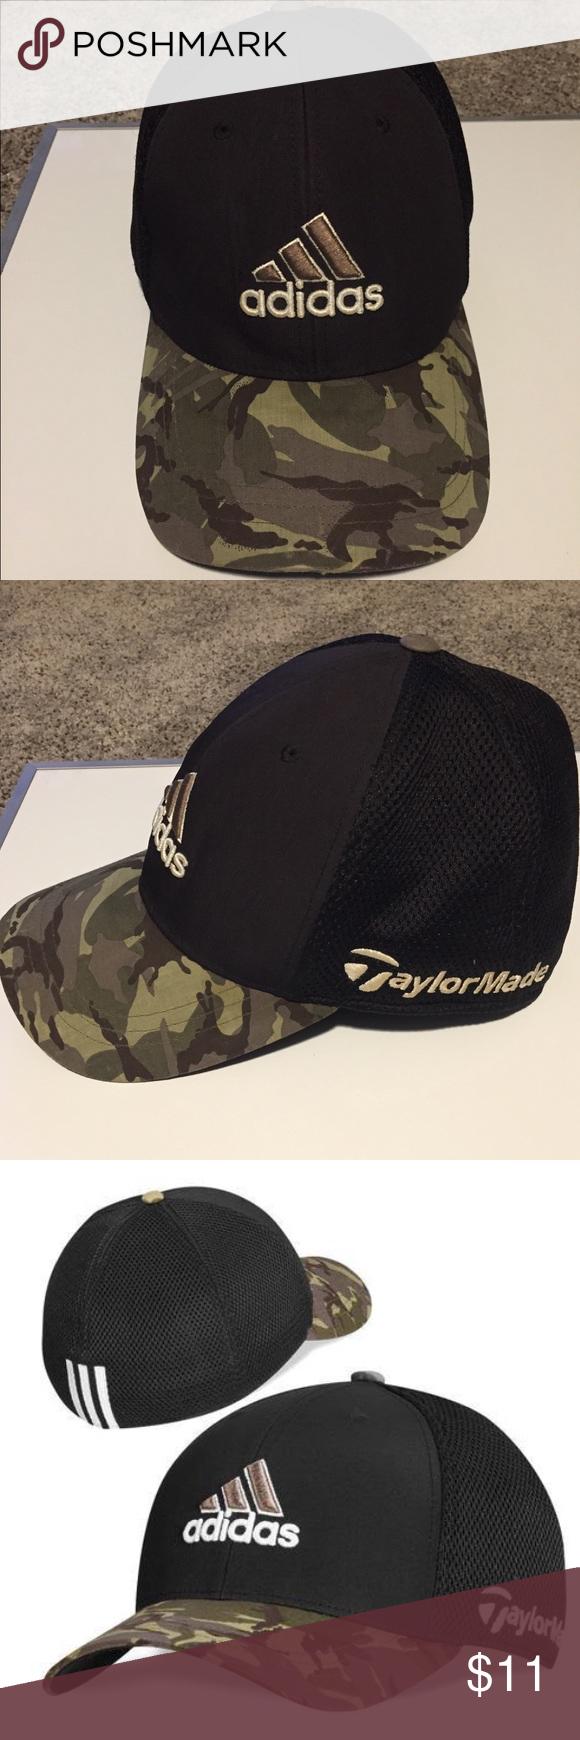 Adidas Tour Mesh Camouflage Fitted Golf Cap (2015) Climacool lightweight  flexfit cap •Flexfit headband adidas Accessories Hats 0c3cdff94ac